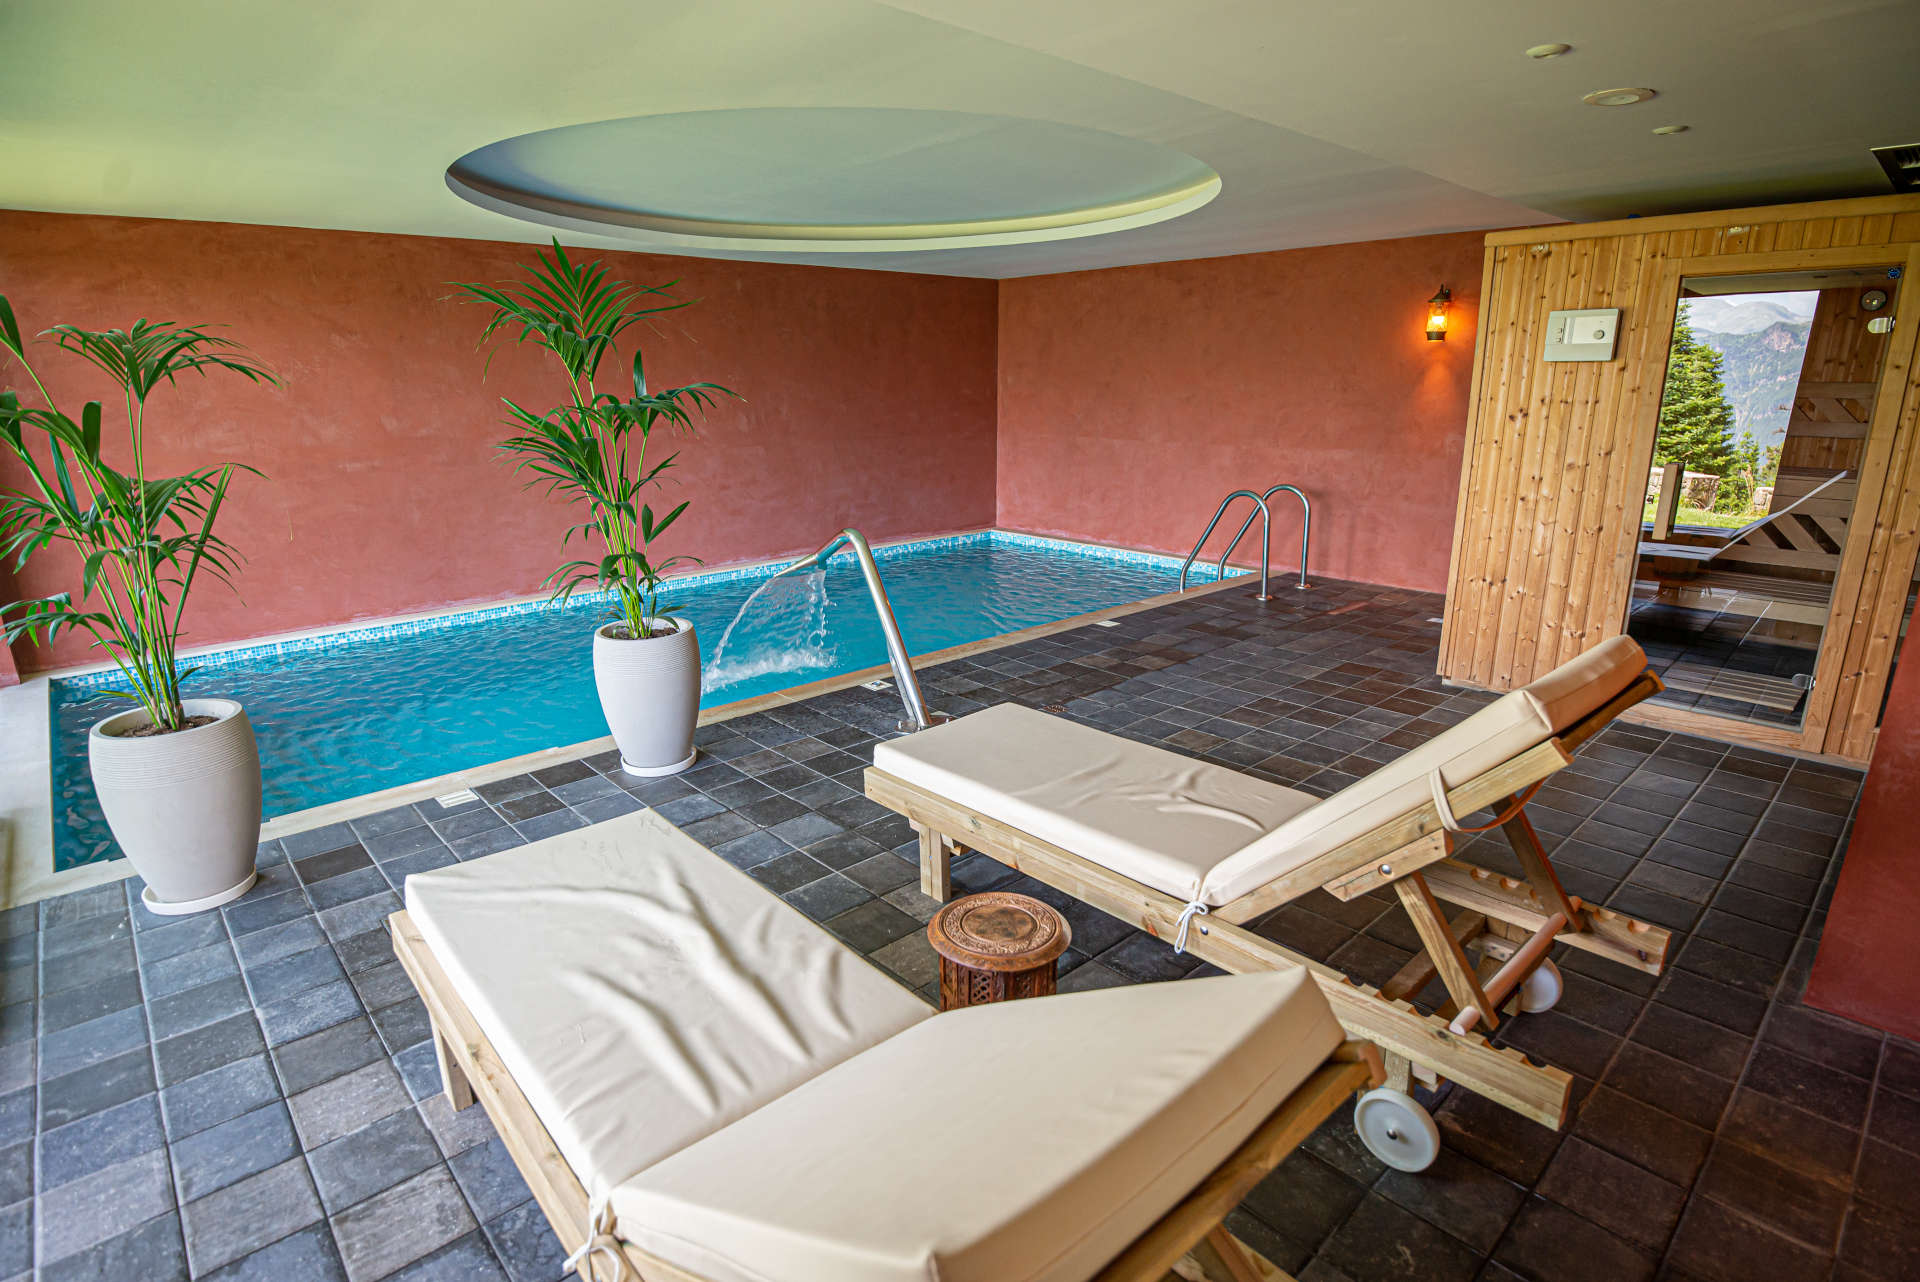 indoor pool in anavasi hotel